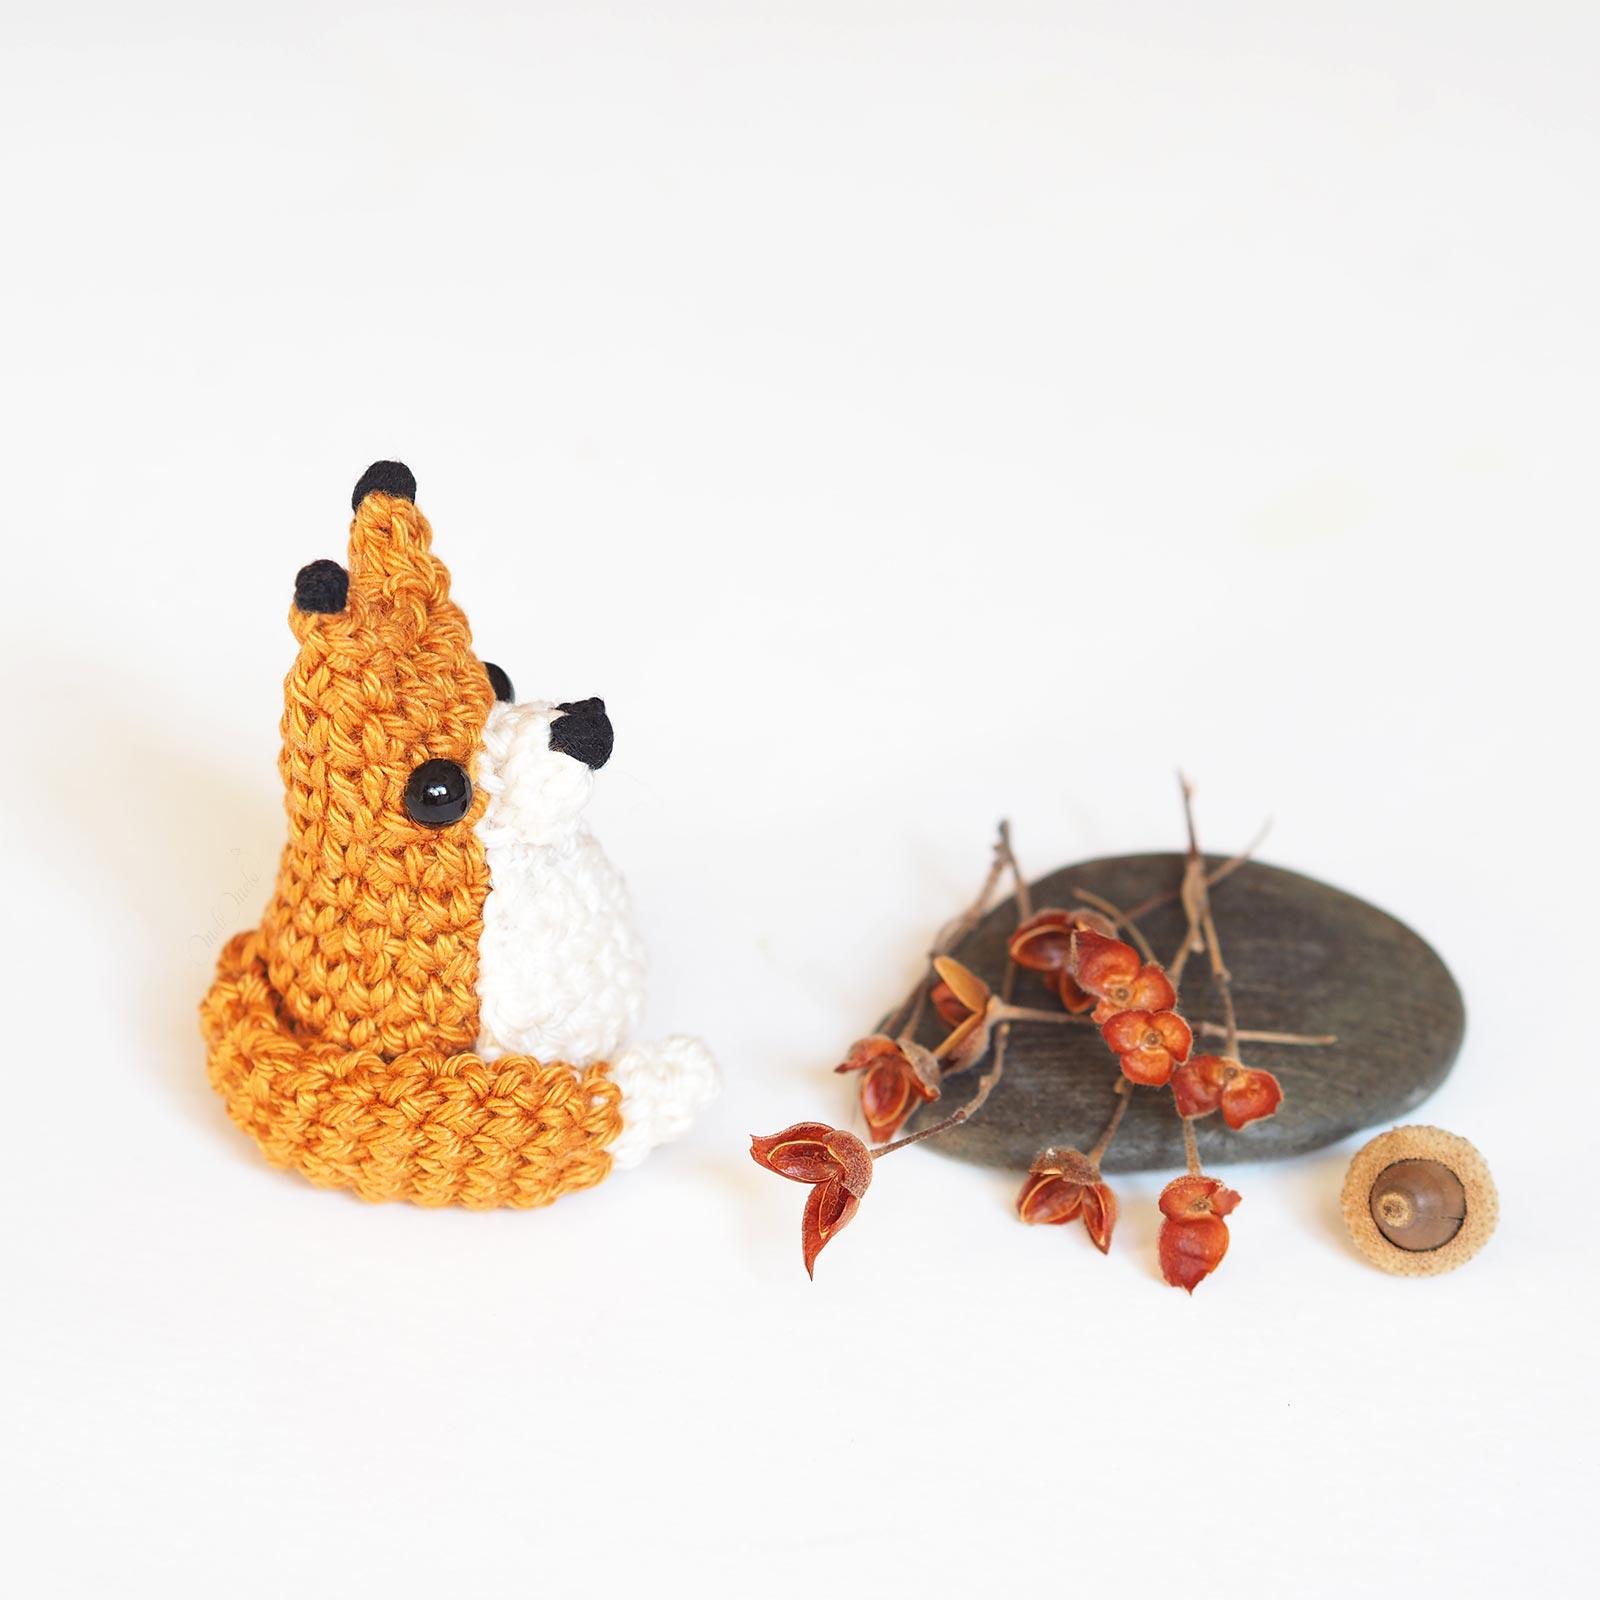 crochet mini renard tiny fox tuto DIY Catona Scheepjes profil laboutiquedemelimelo